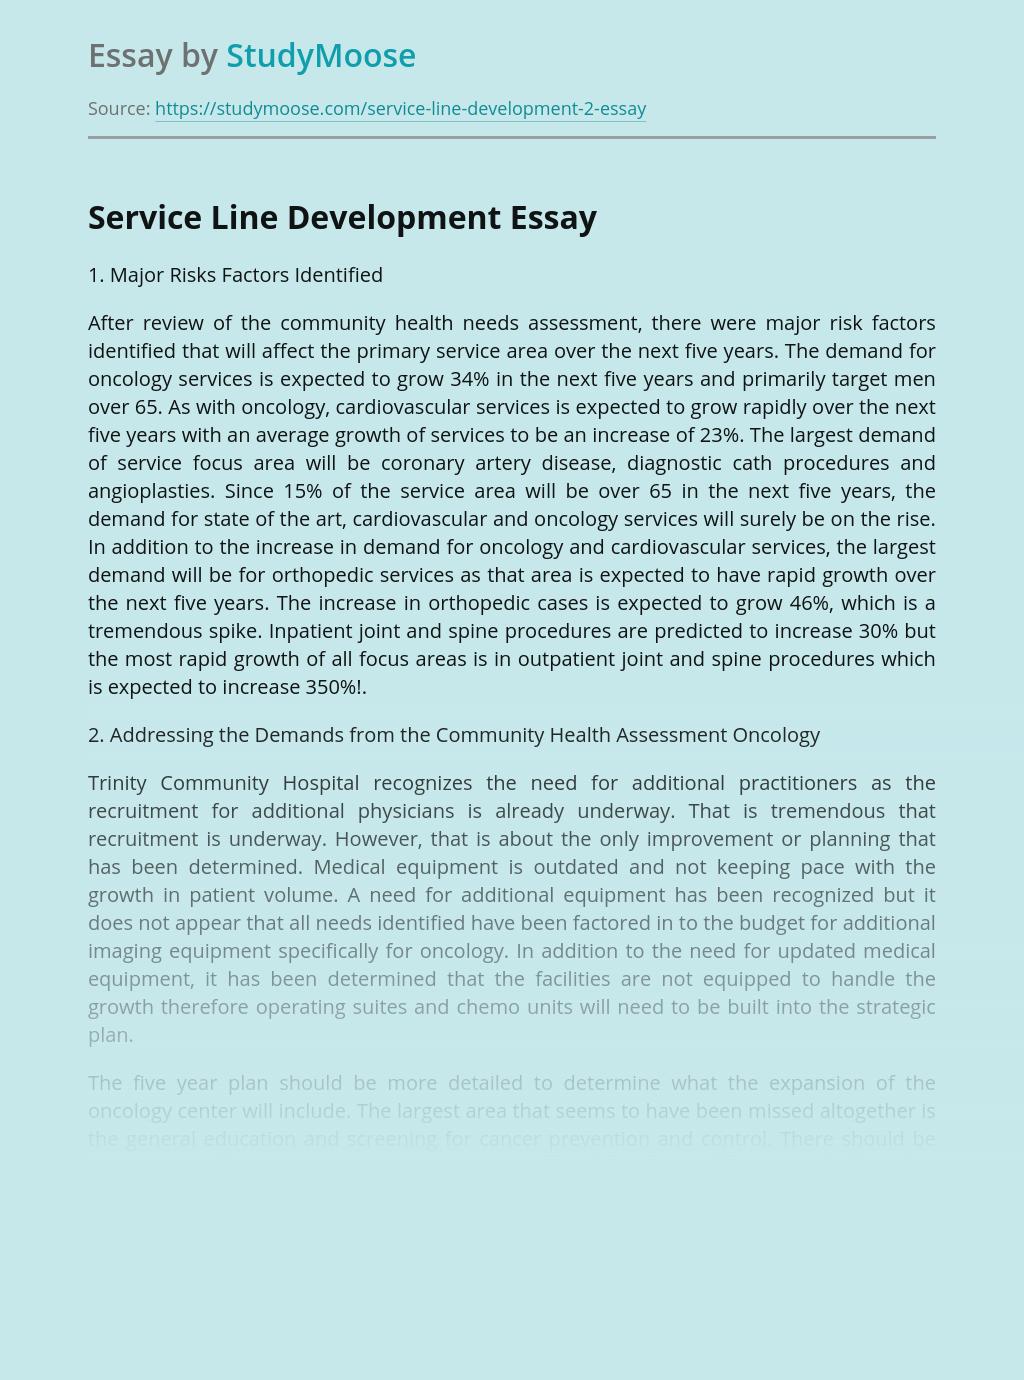 Service Line Development